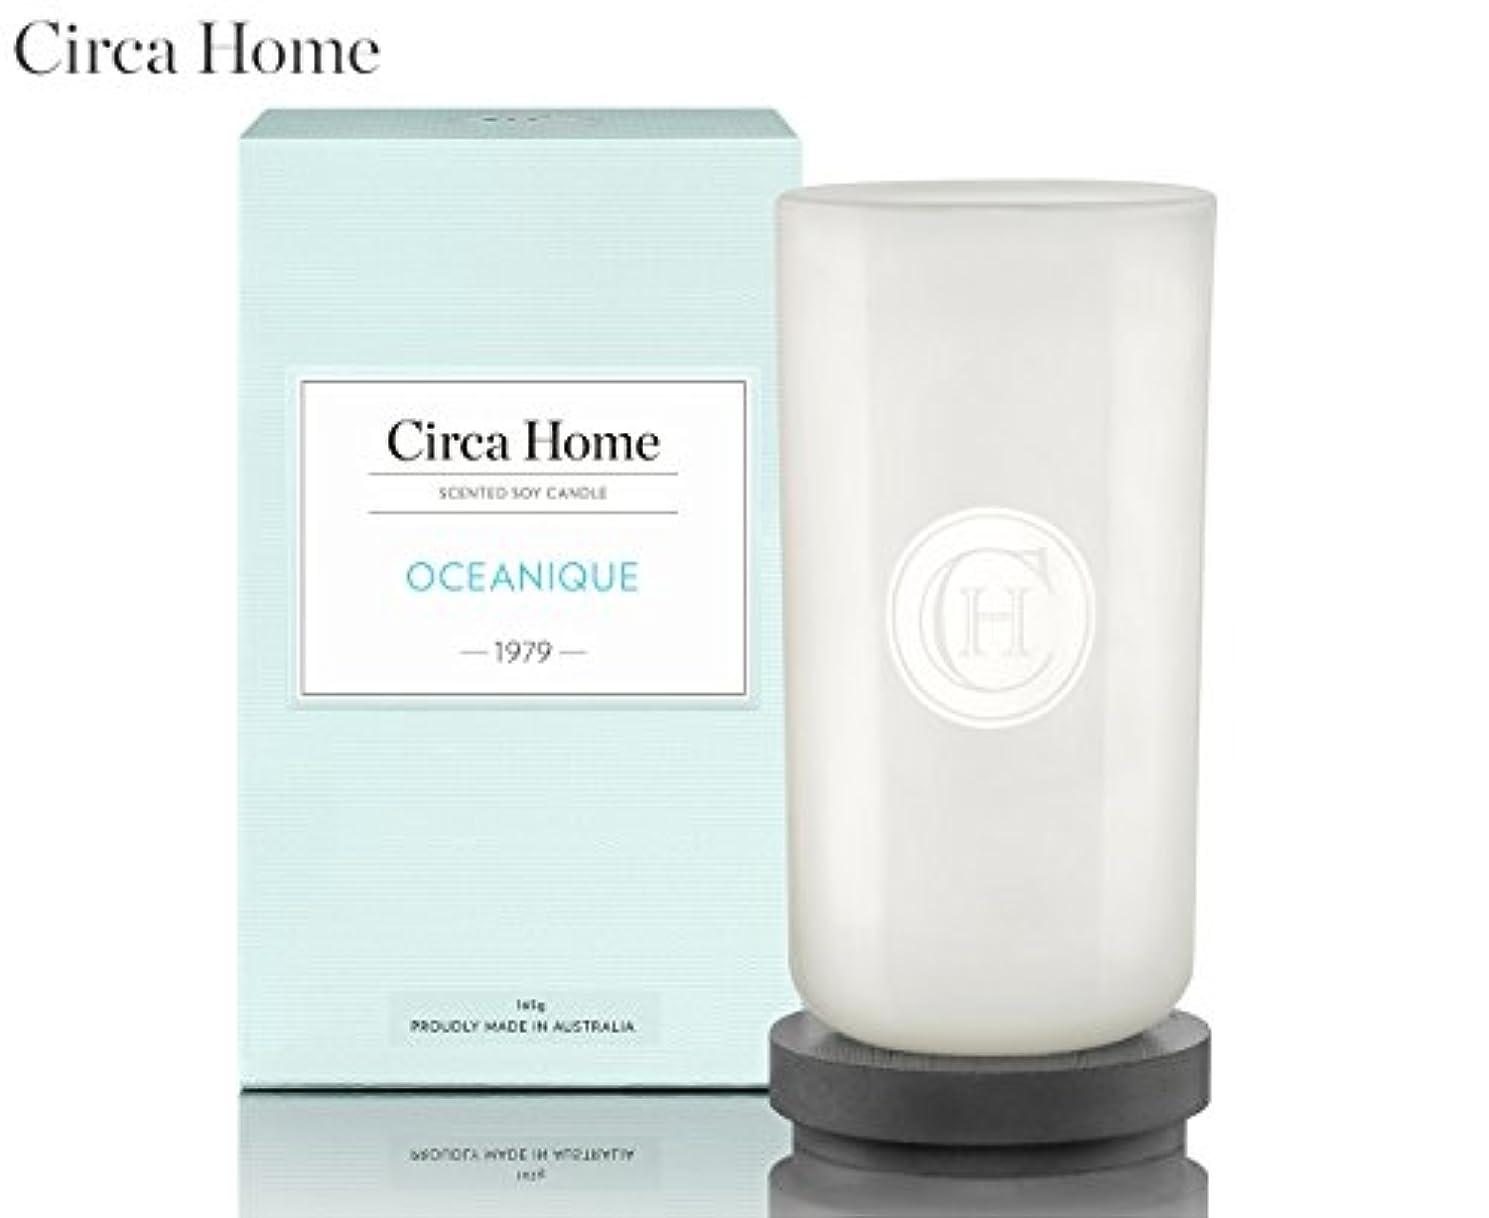 Circa Home キャンドル(165g) 1979 OCEANIQUE